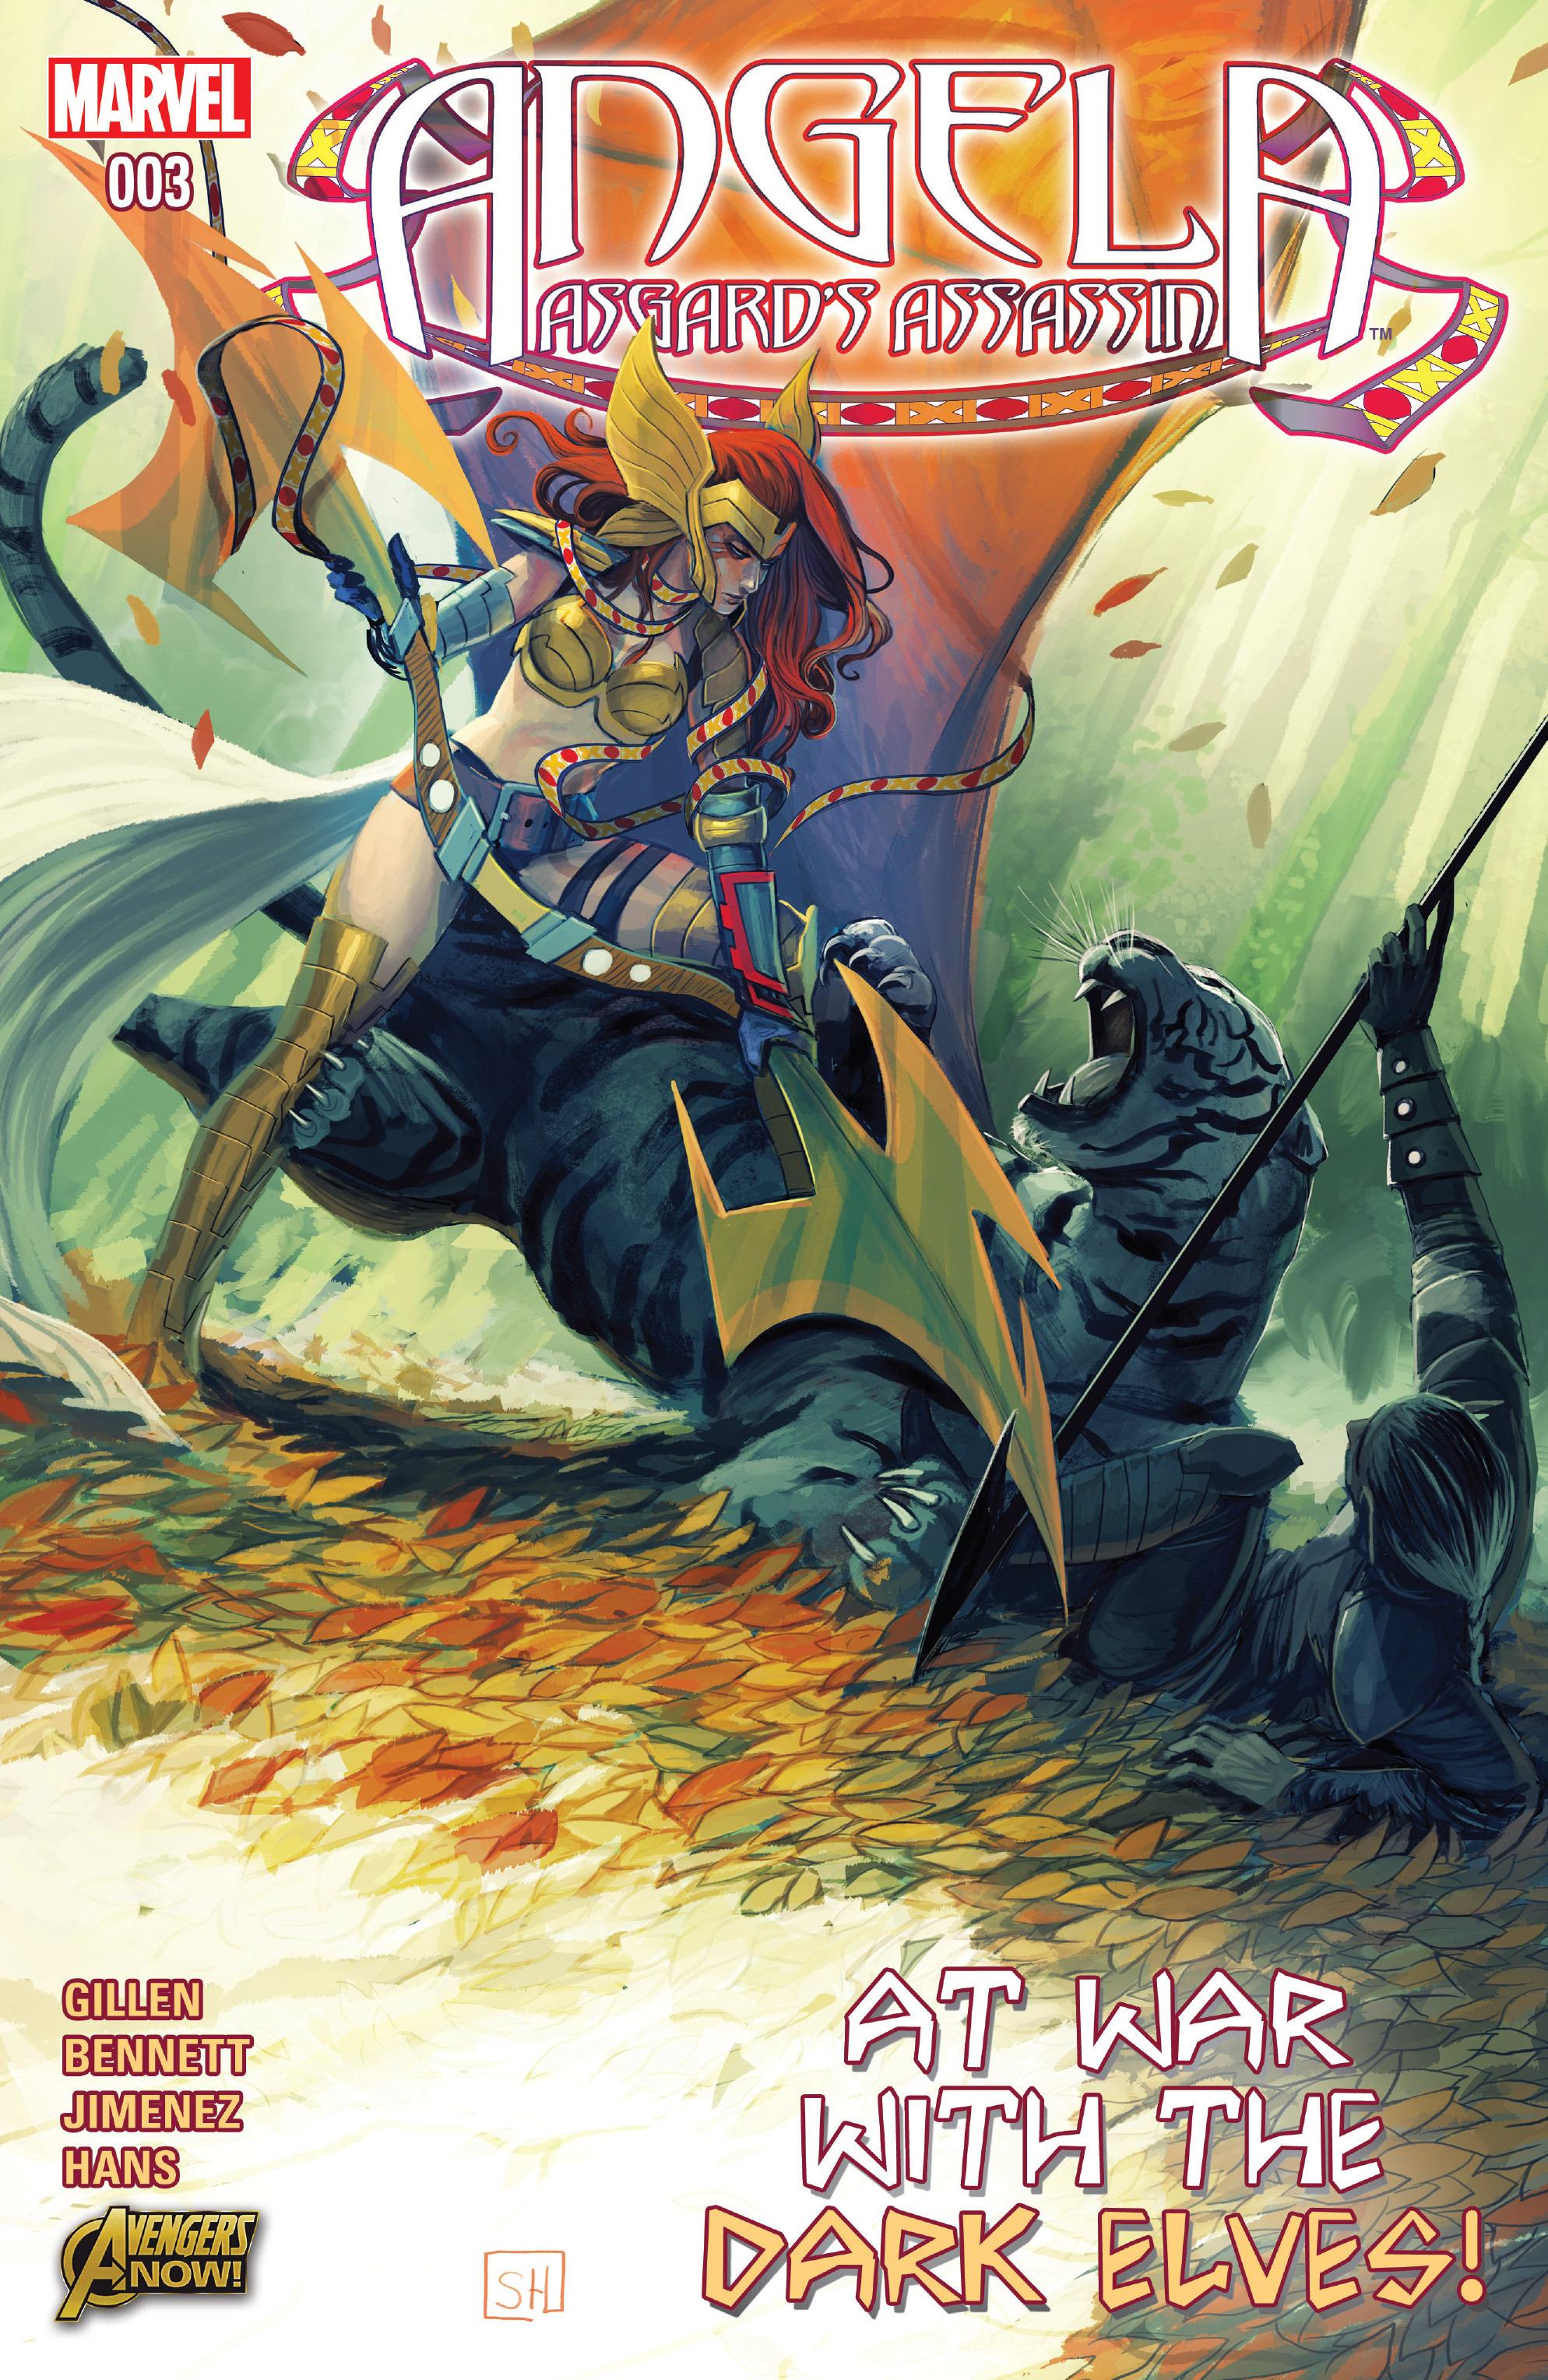 Read online Angela: Asgard's Assassin comic -  Issue #3 - 1